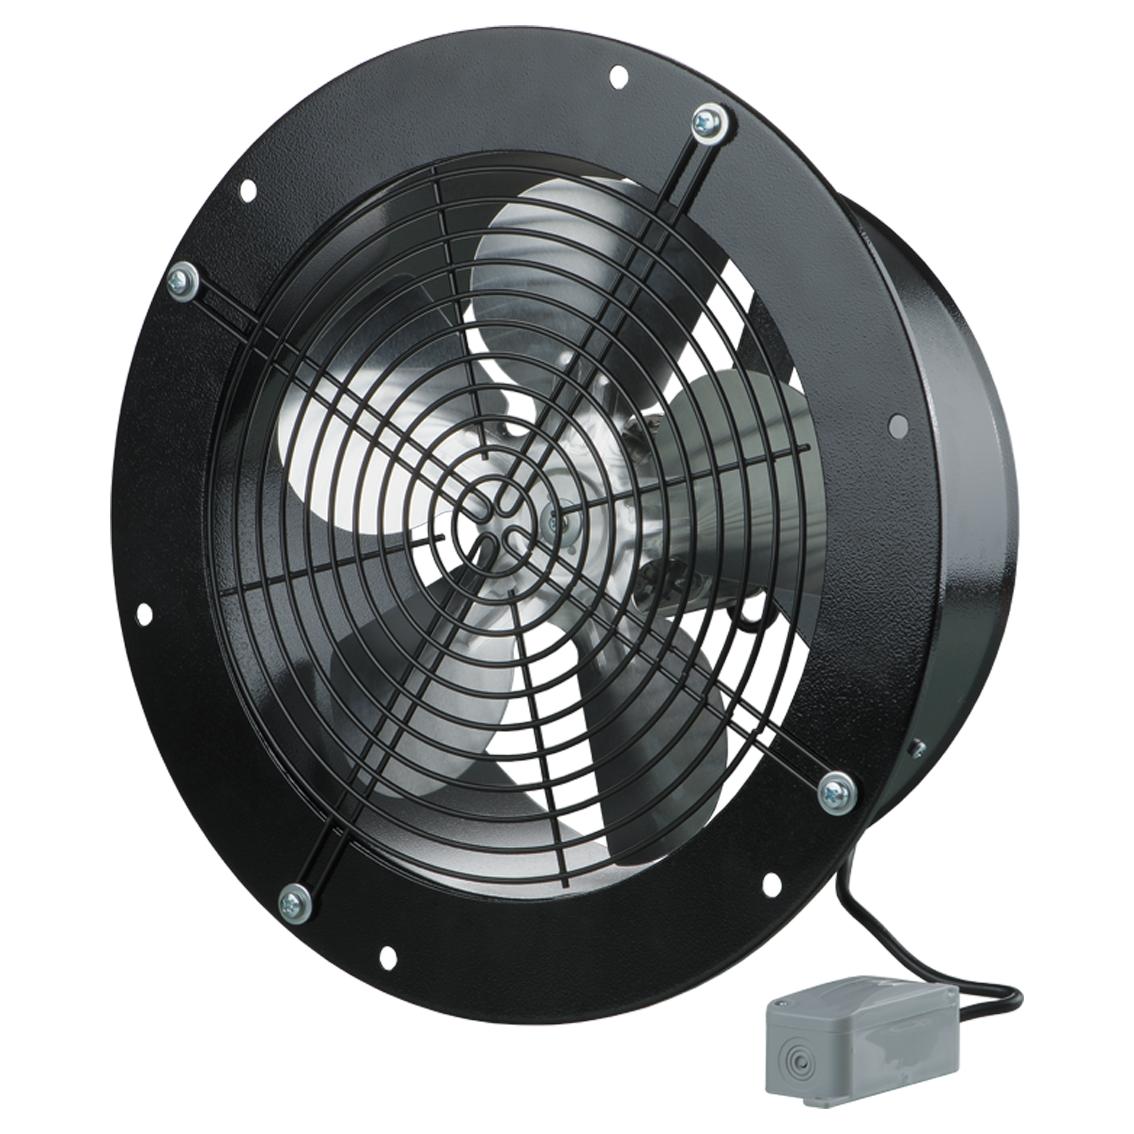 Ventilator aksijalni OVK1 250 Vents Elektro Vukojevic